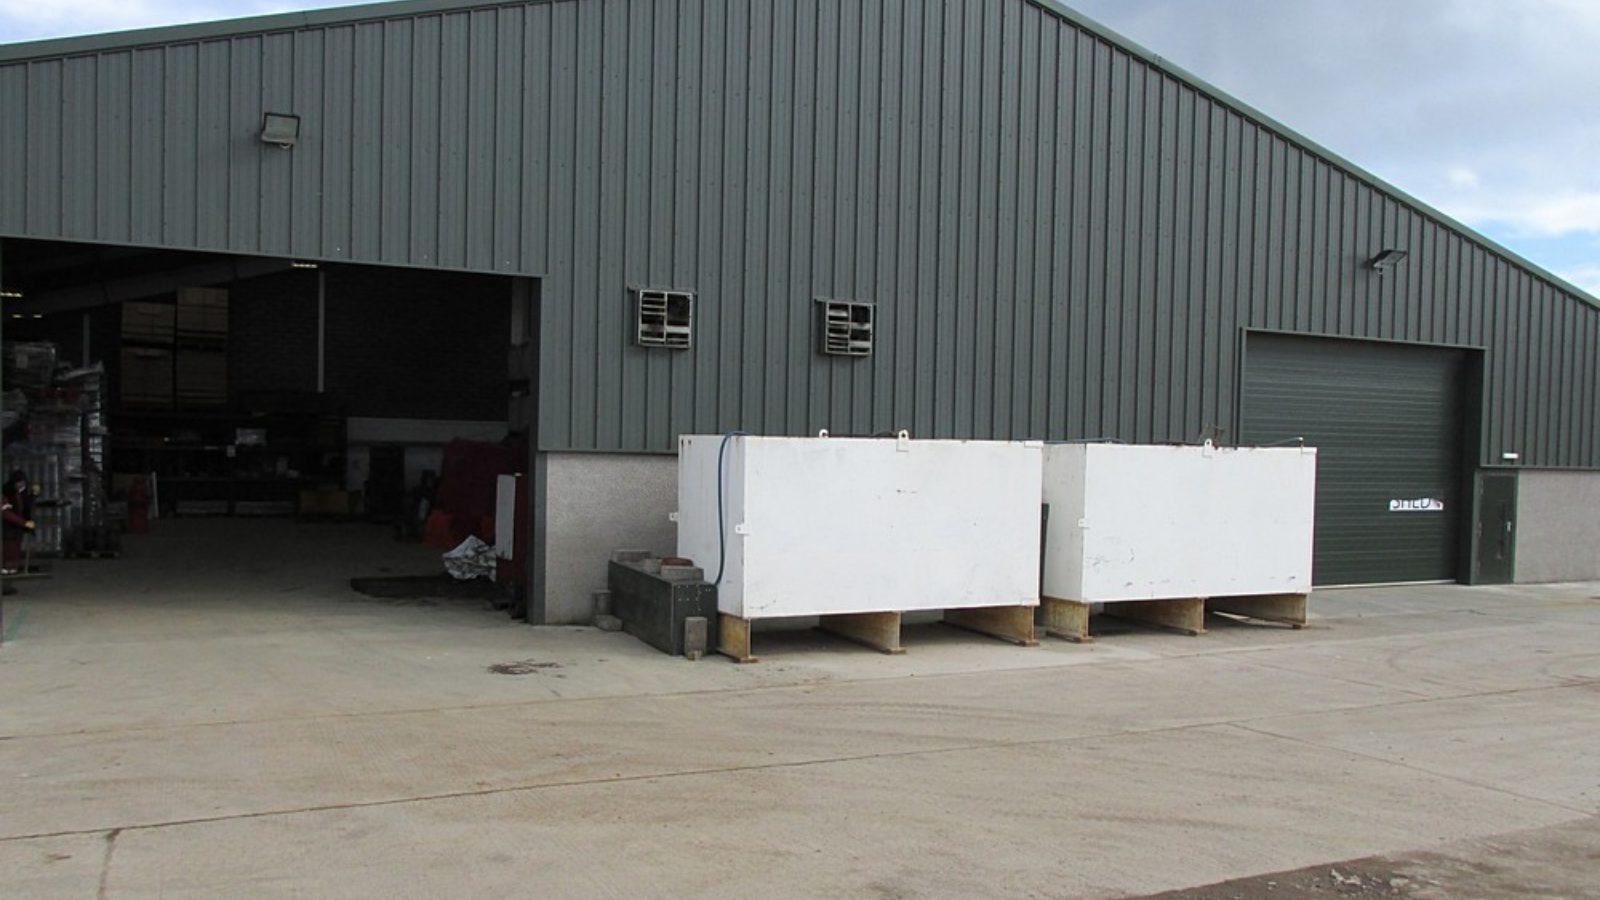 Norkram Limited: Refurbishing and resupplying thread protectors